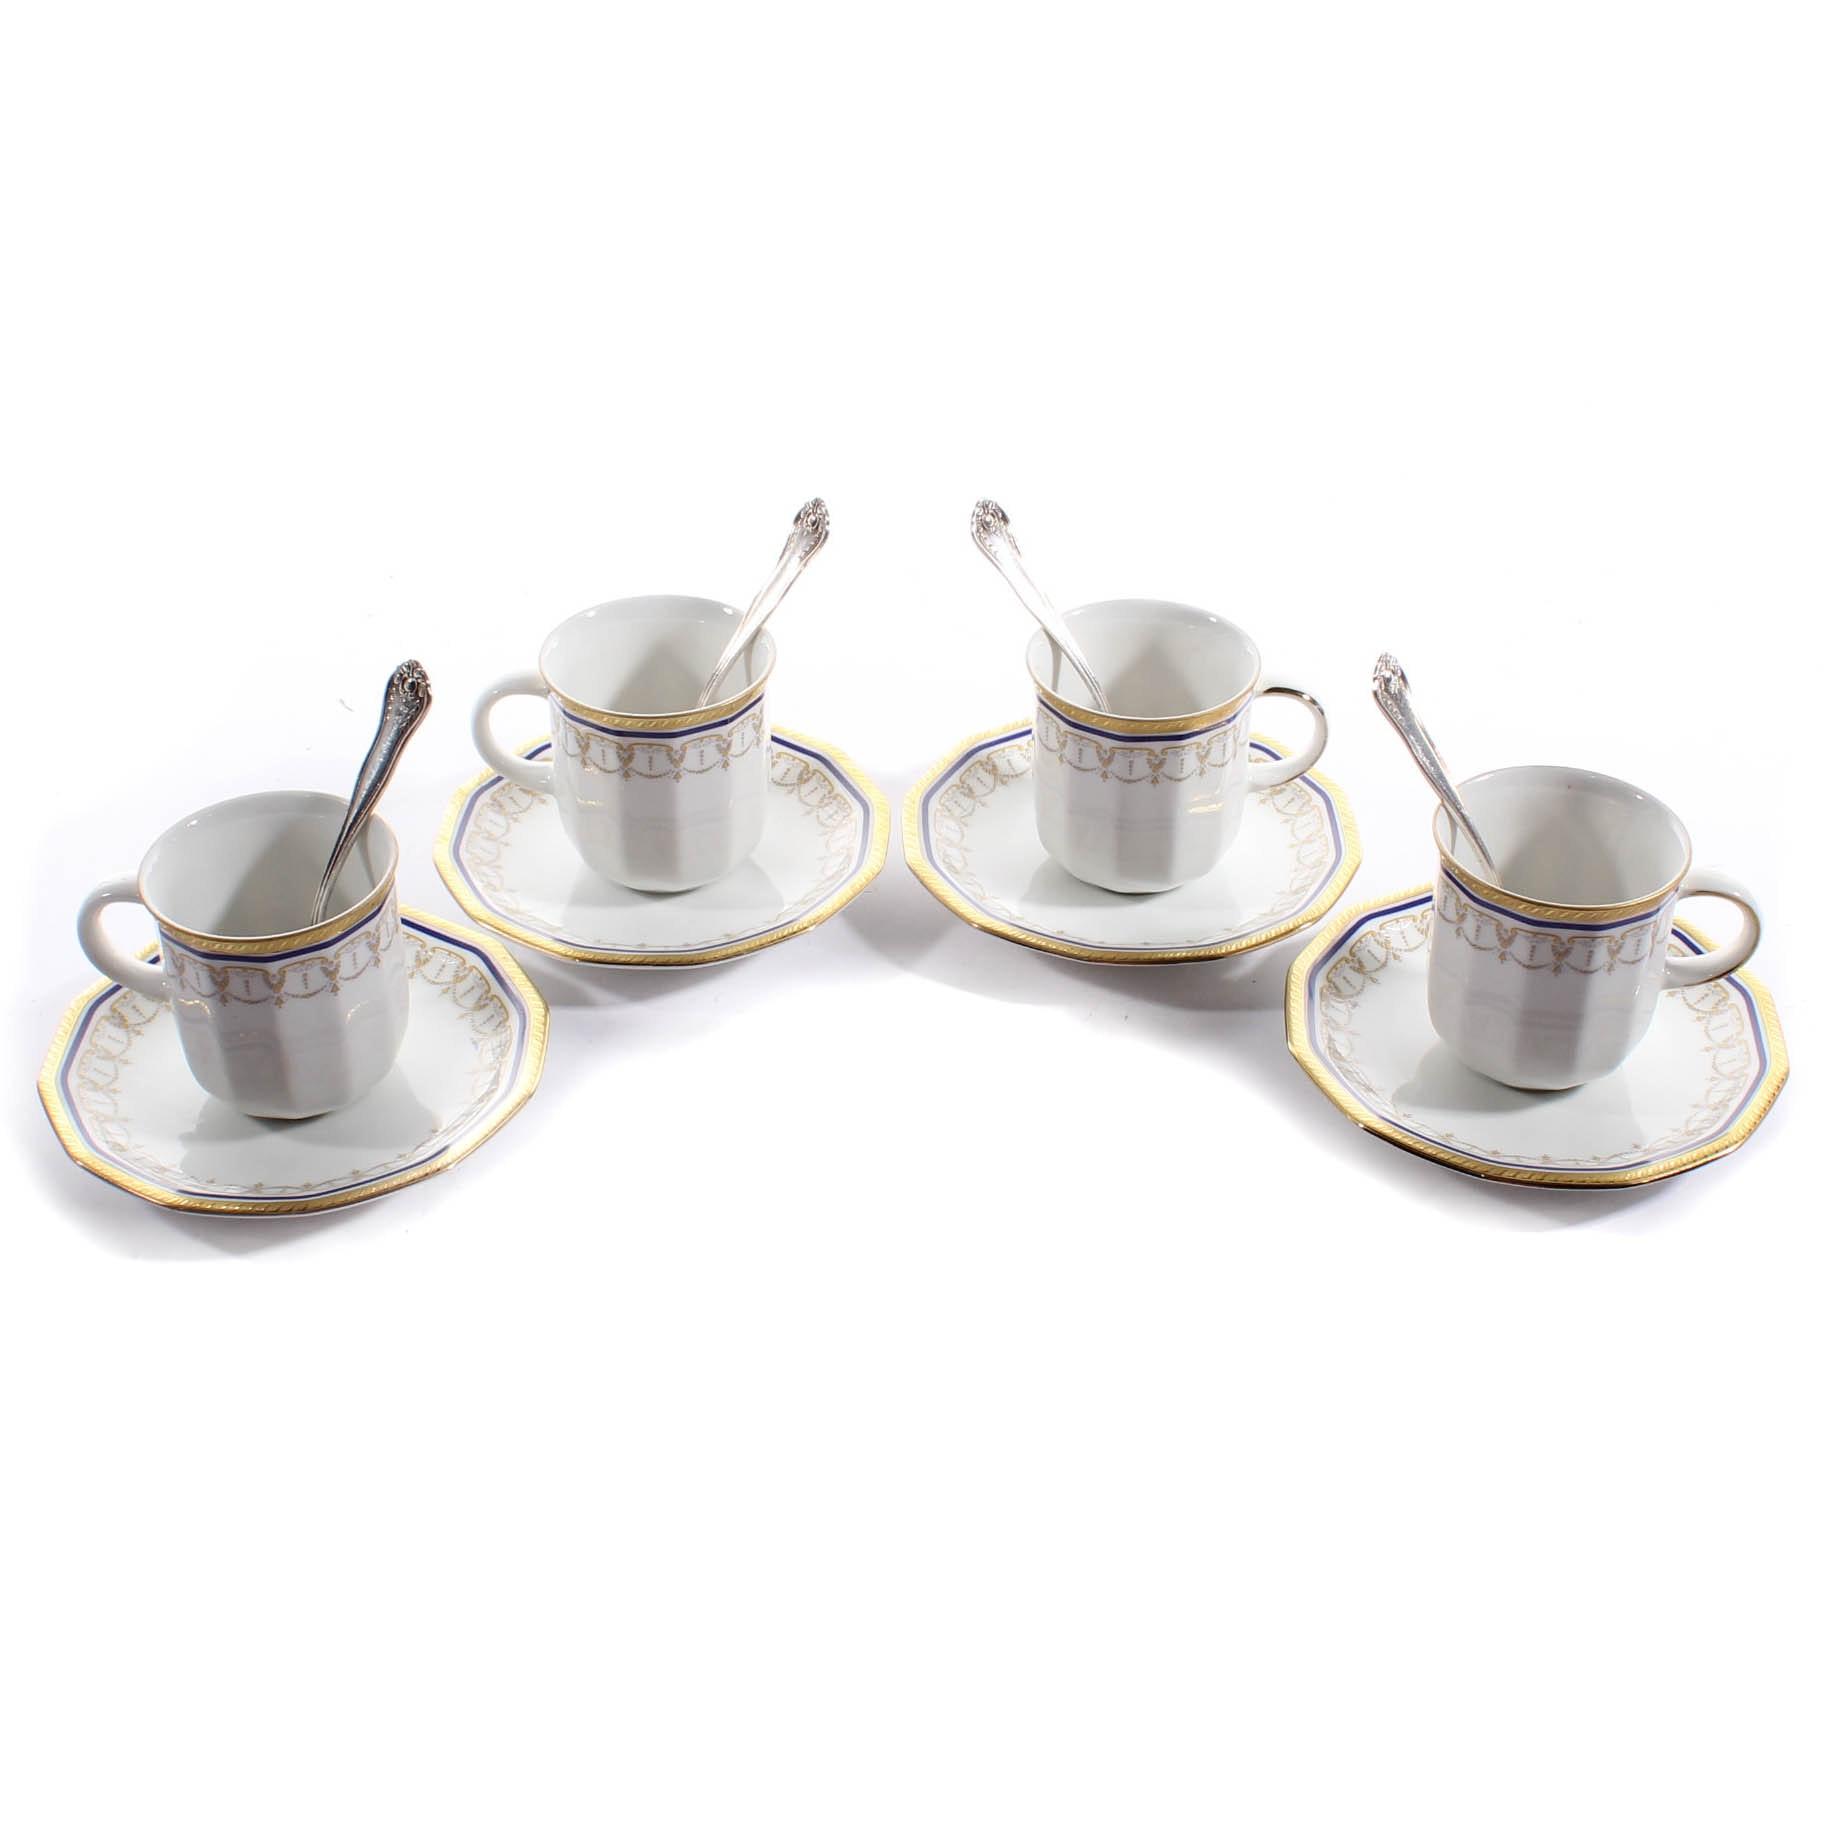 Tirschenreuth Porcelain Demitasse Set and National Silver Plate Spoons